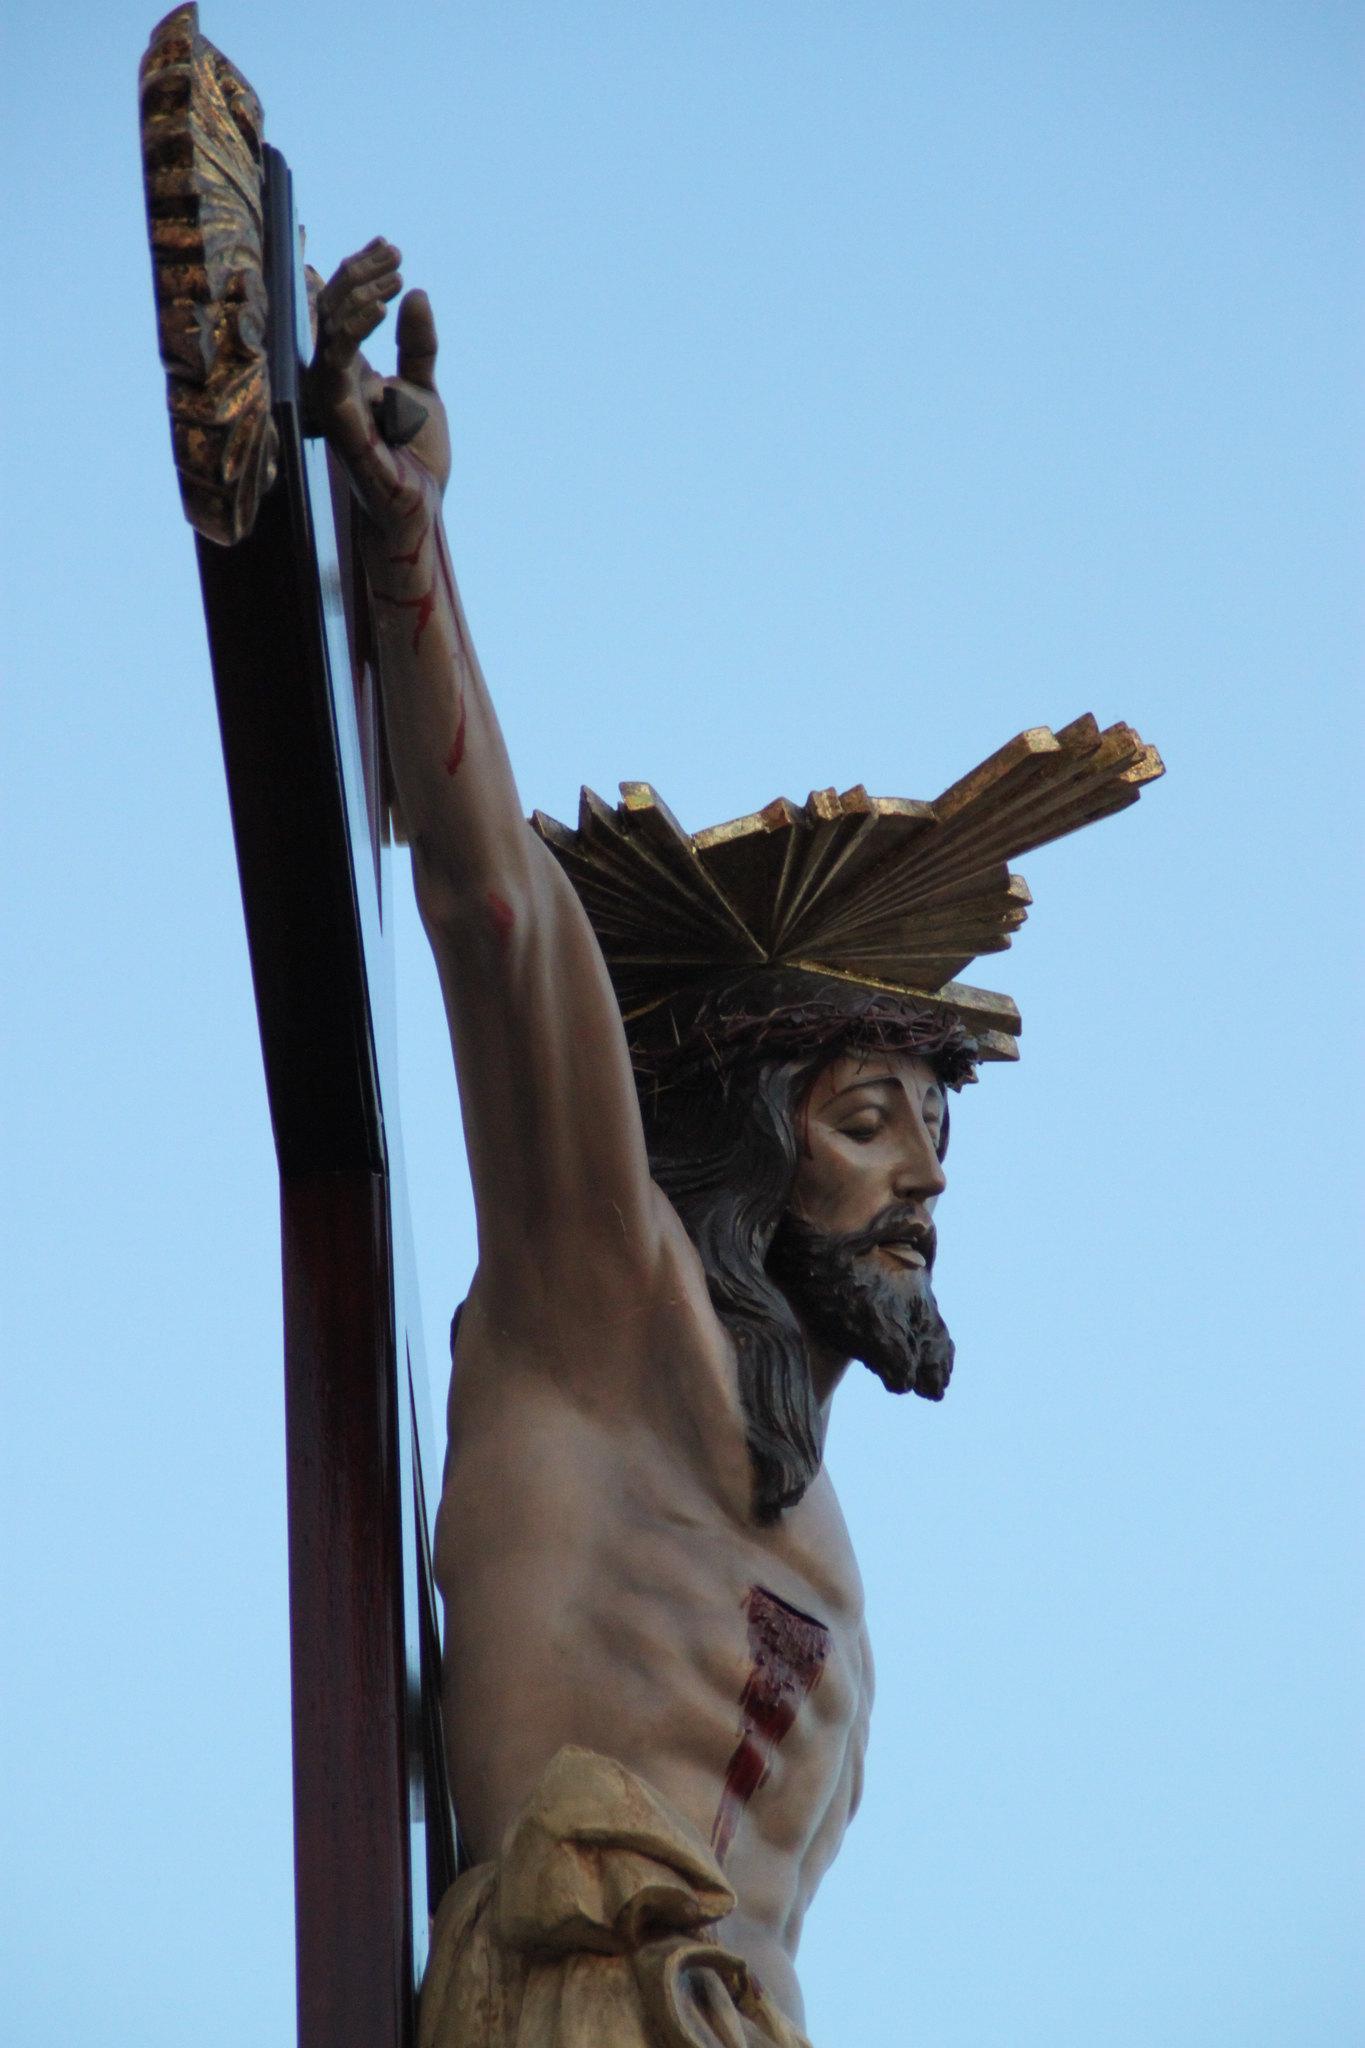 (2013-07-07) -  Procesión subida - Javier Romero Ripoll  (169)